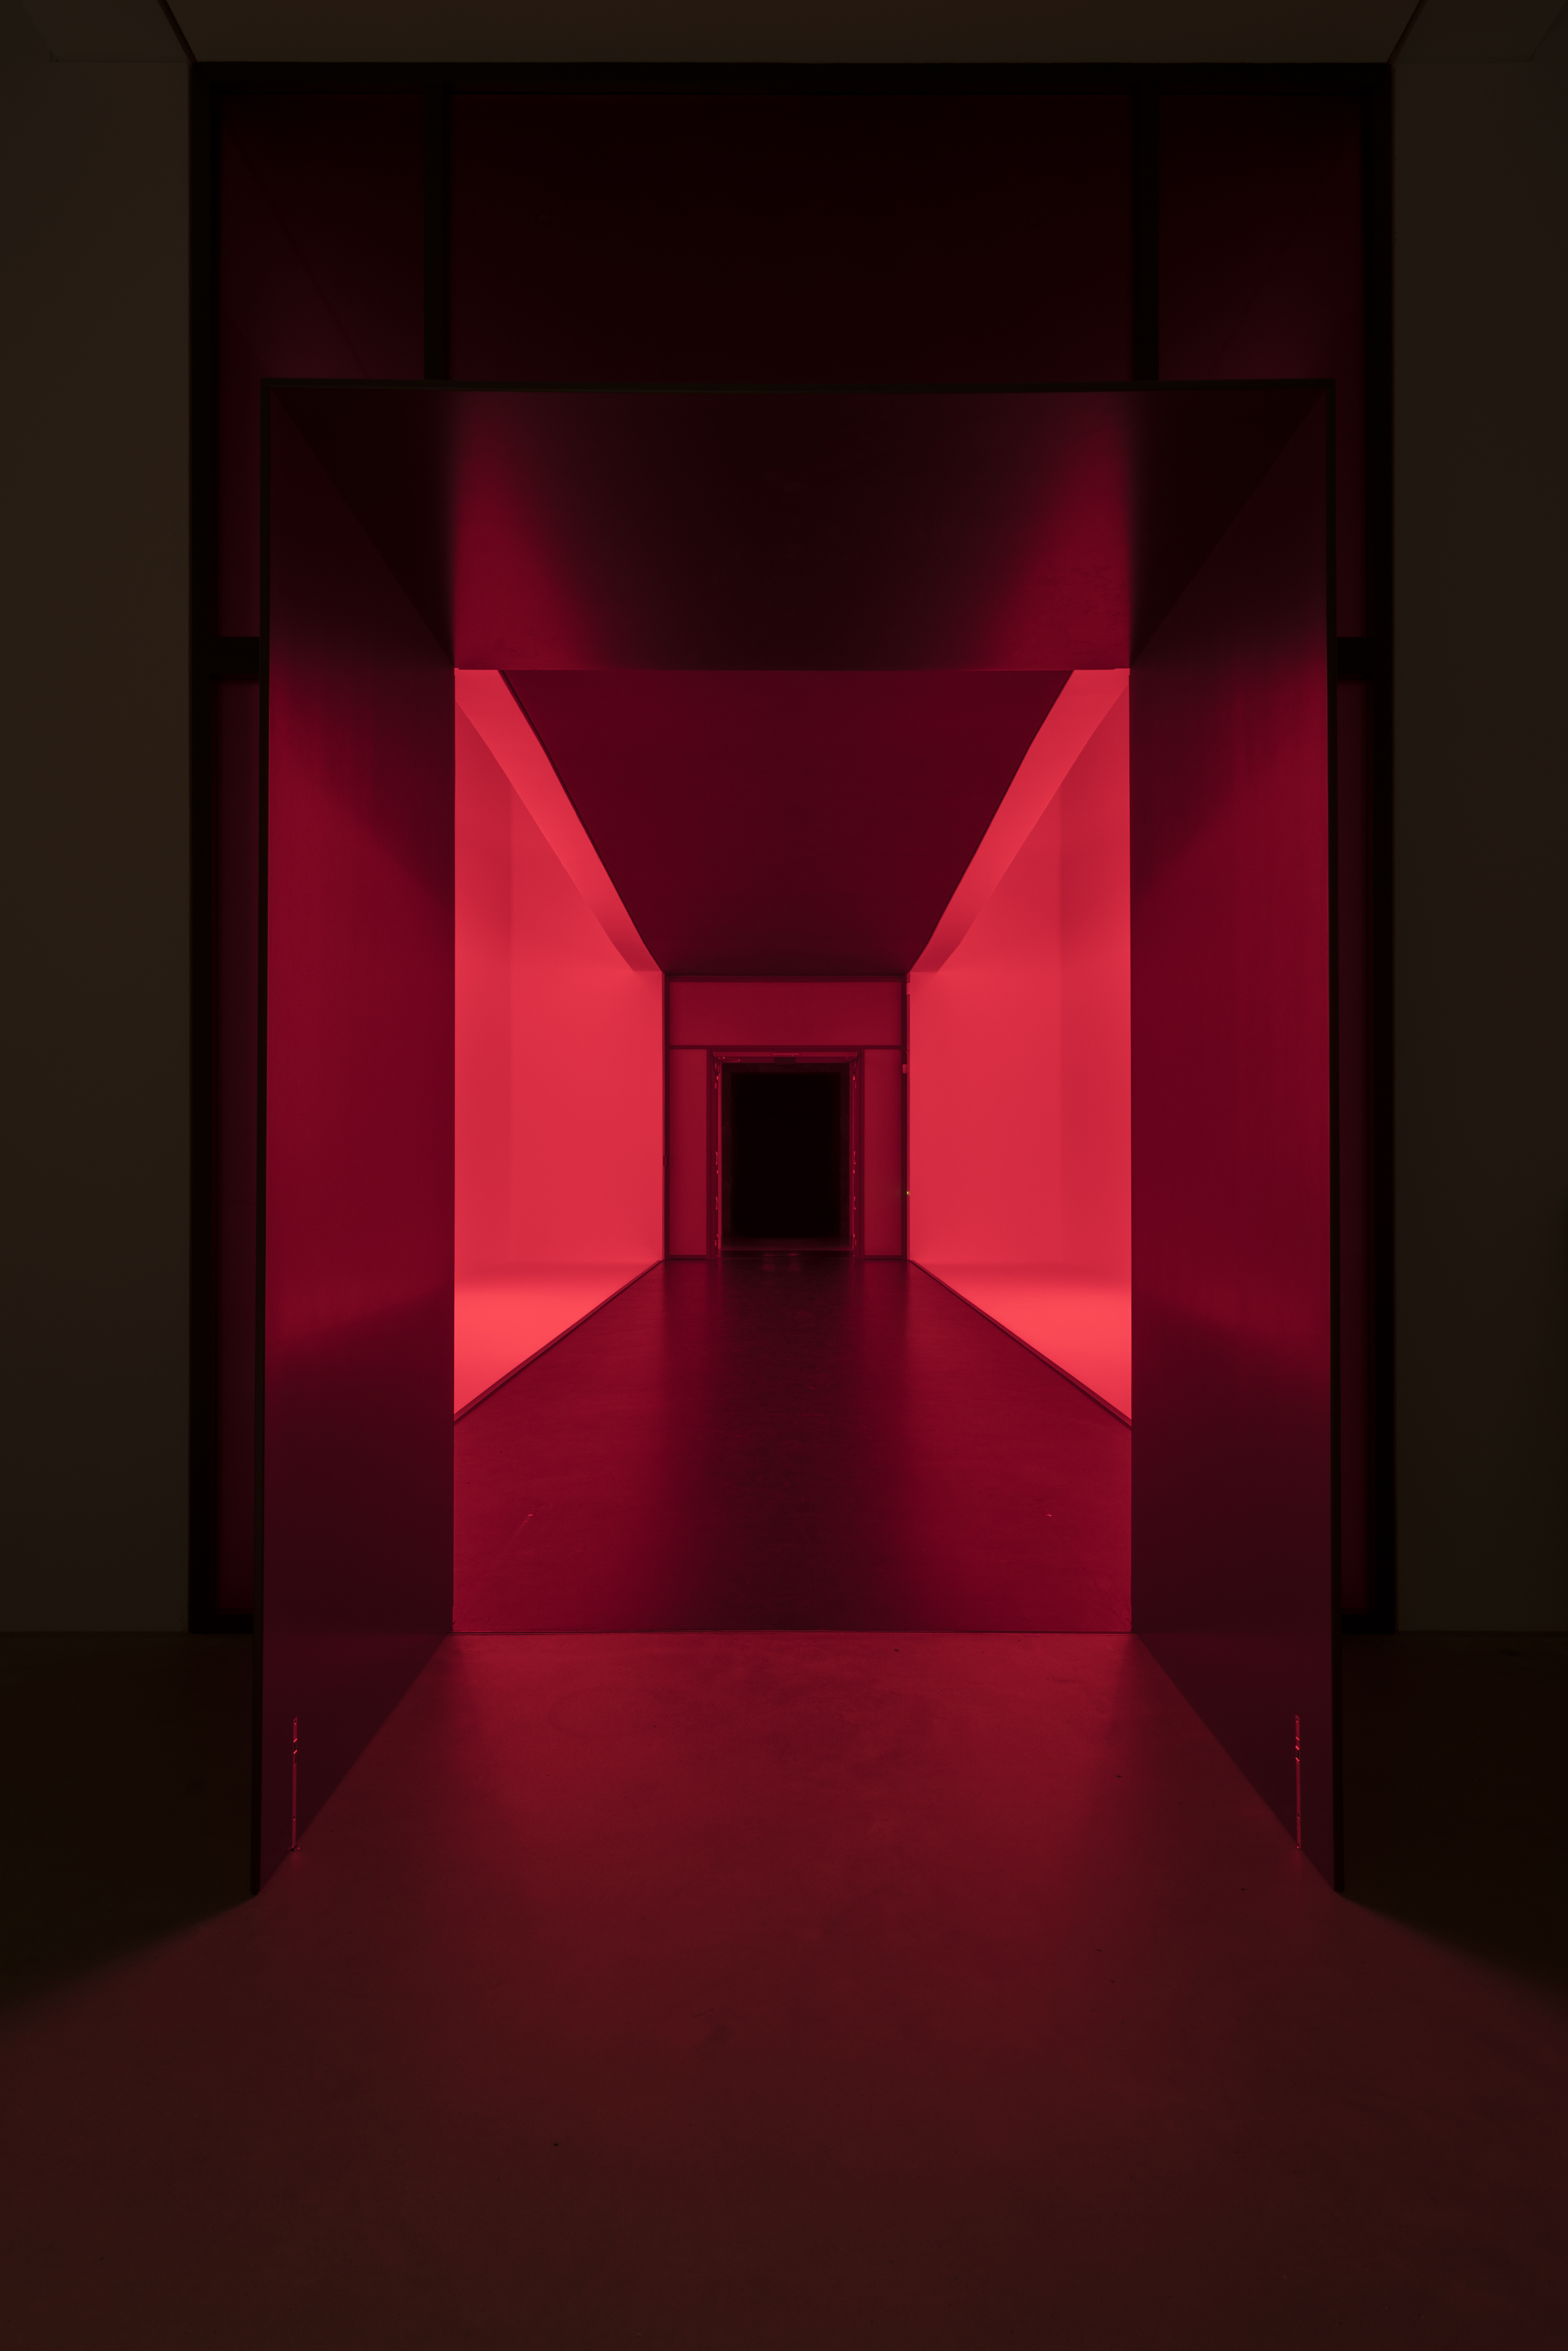 © James Turrell, Sammlung Kunsthalle Mannheim, photo: Kunsthalle Mannheim/Florian Holzherr